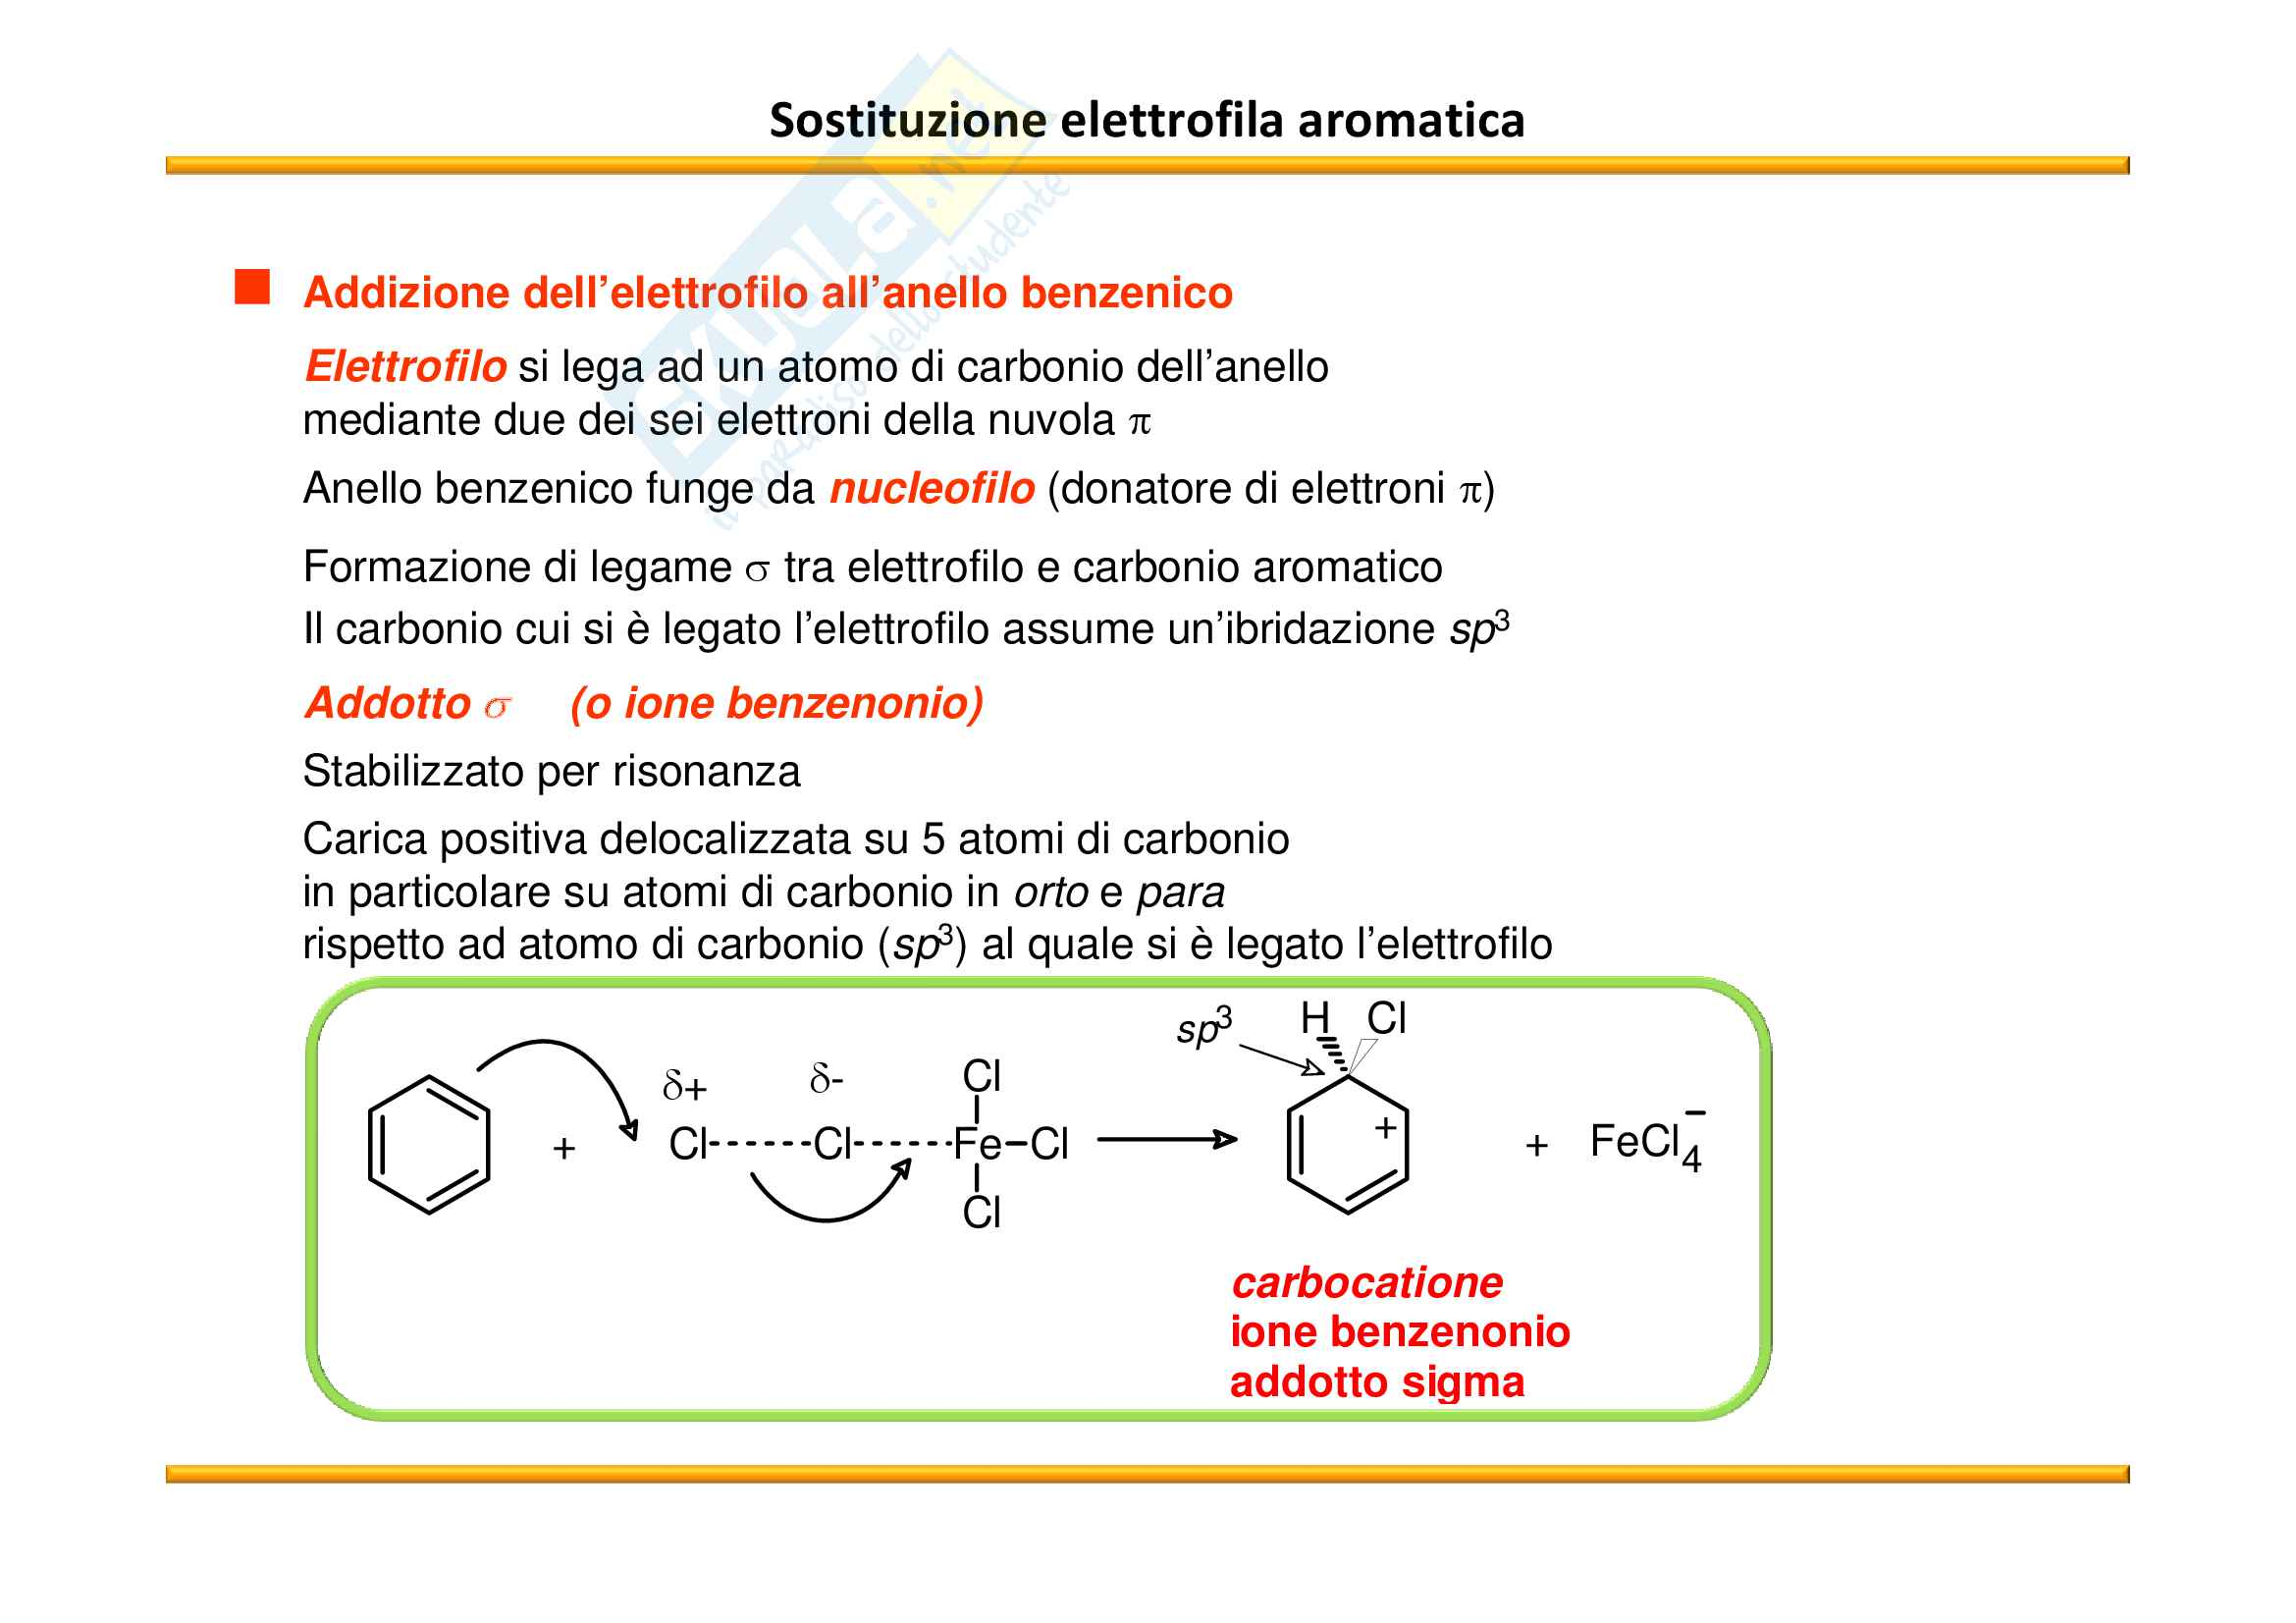 Chimica Organica: Composti aromatici Pag. 36